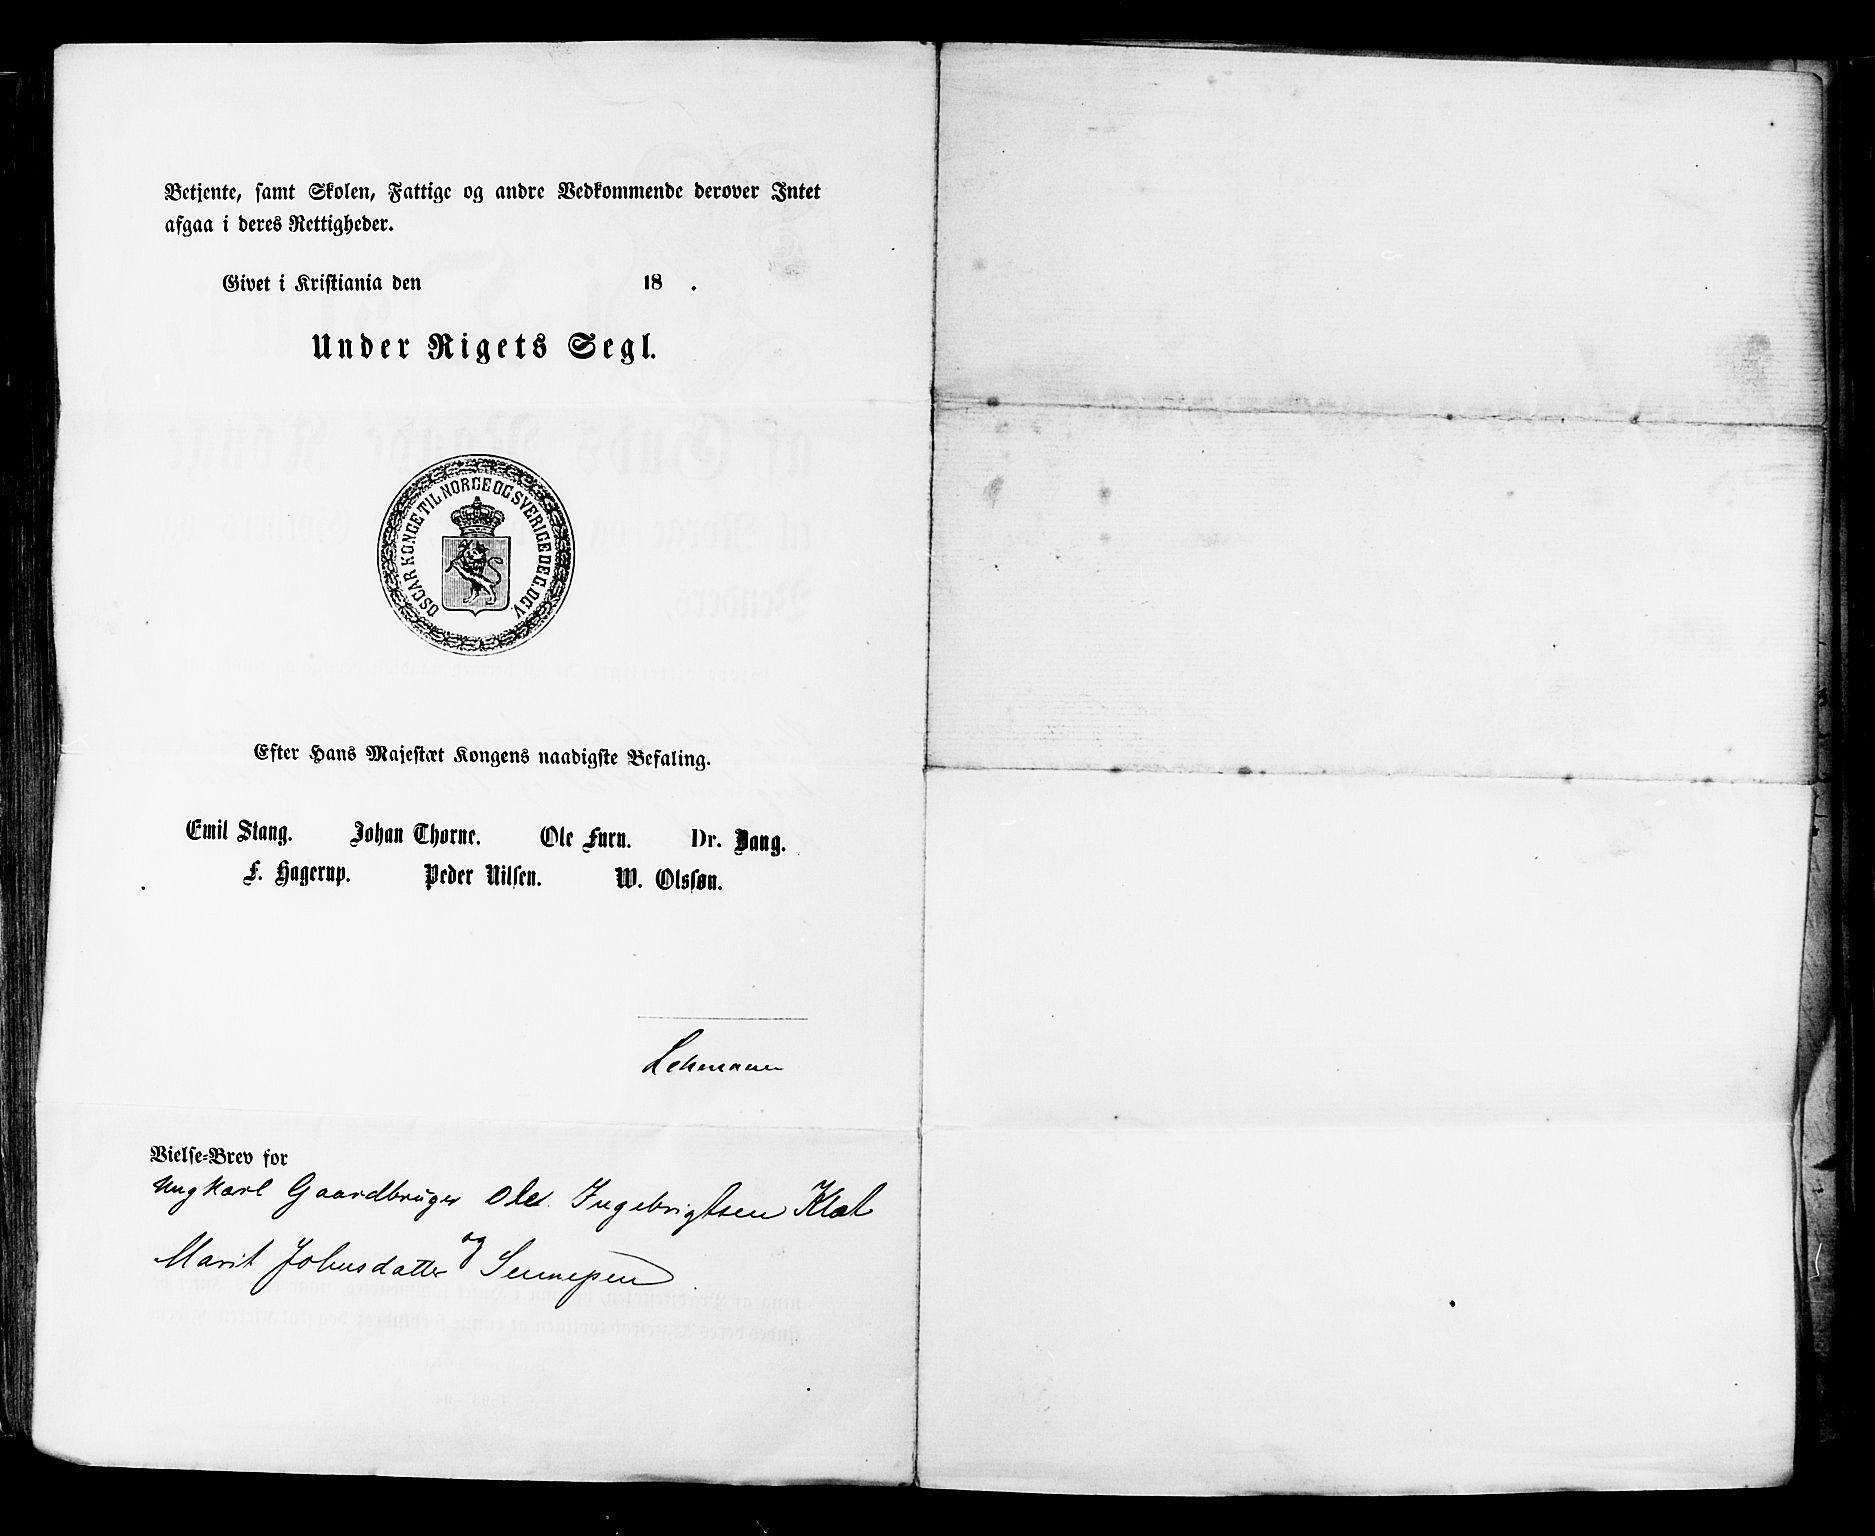 SAT, Ministerialprotokoller, klokkerbøker og fødselsregistre - Nordland, 801/L0009: Ministerialbok nr. 801A09, 1876-1883